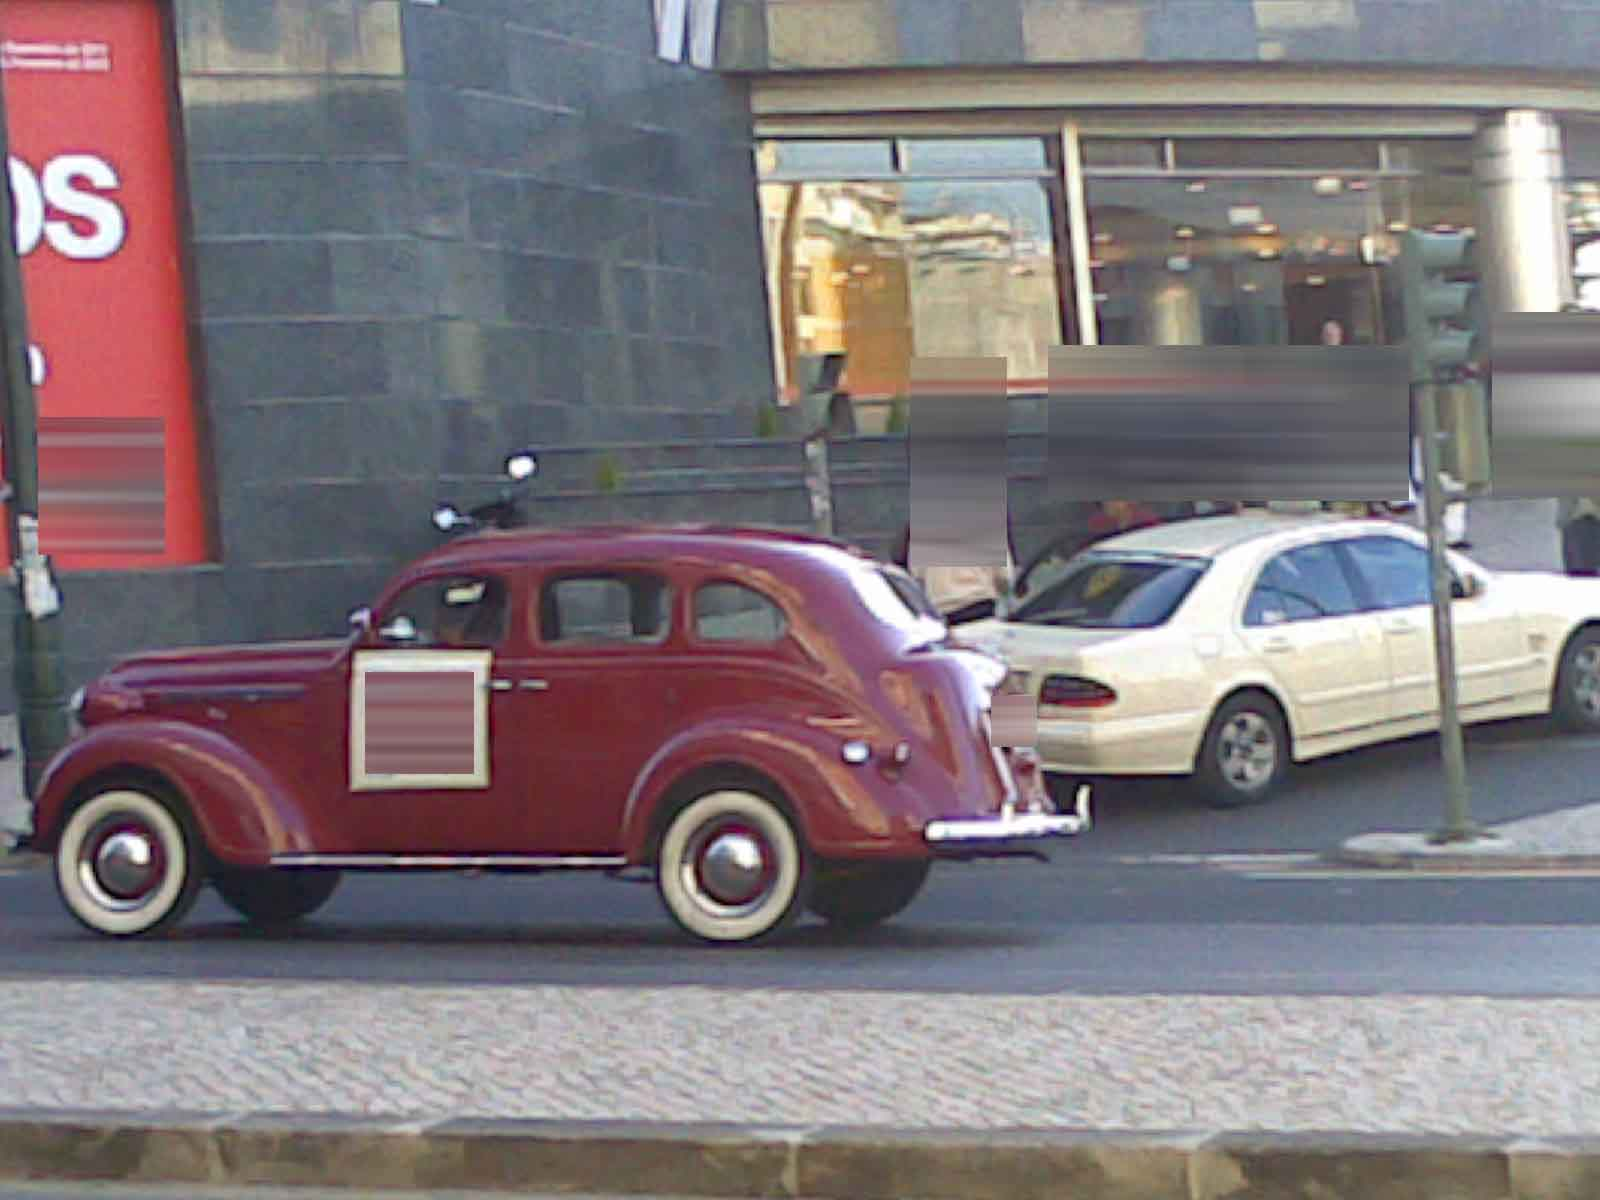 1955 dodge custom royal lancer 4 door sedan 15699 - Filename Dodge 4 Door Sedan 1937 Jpg